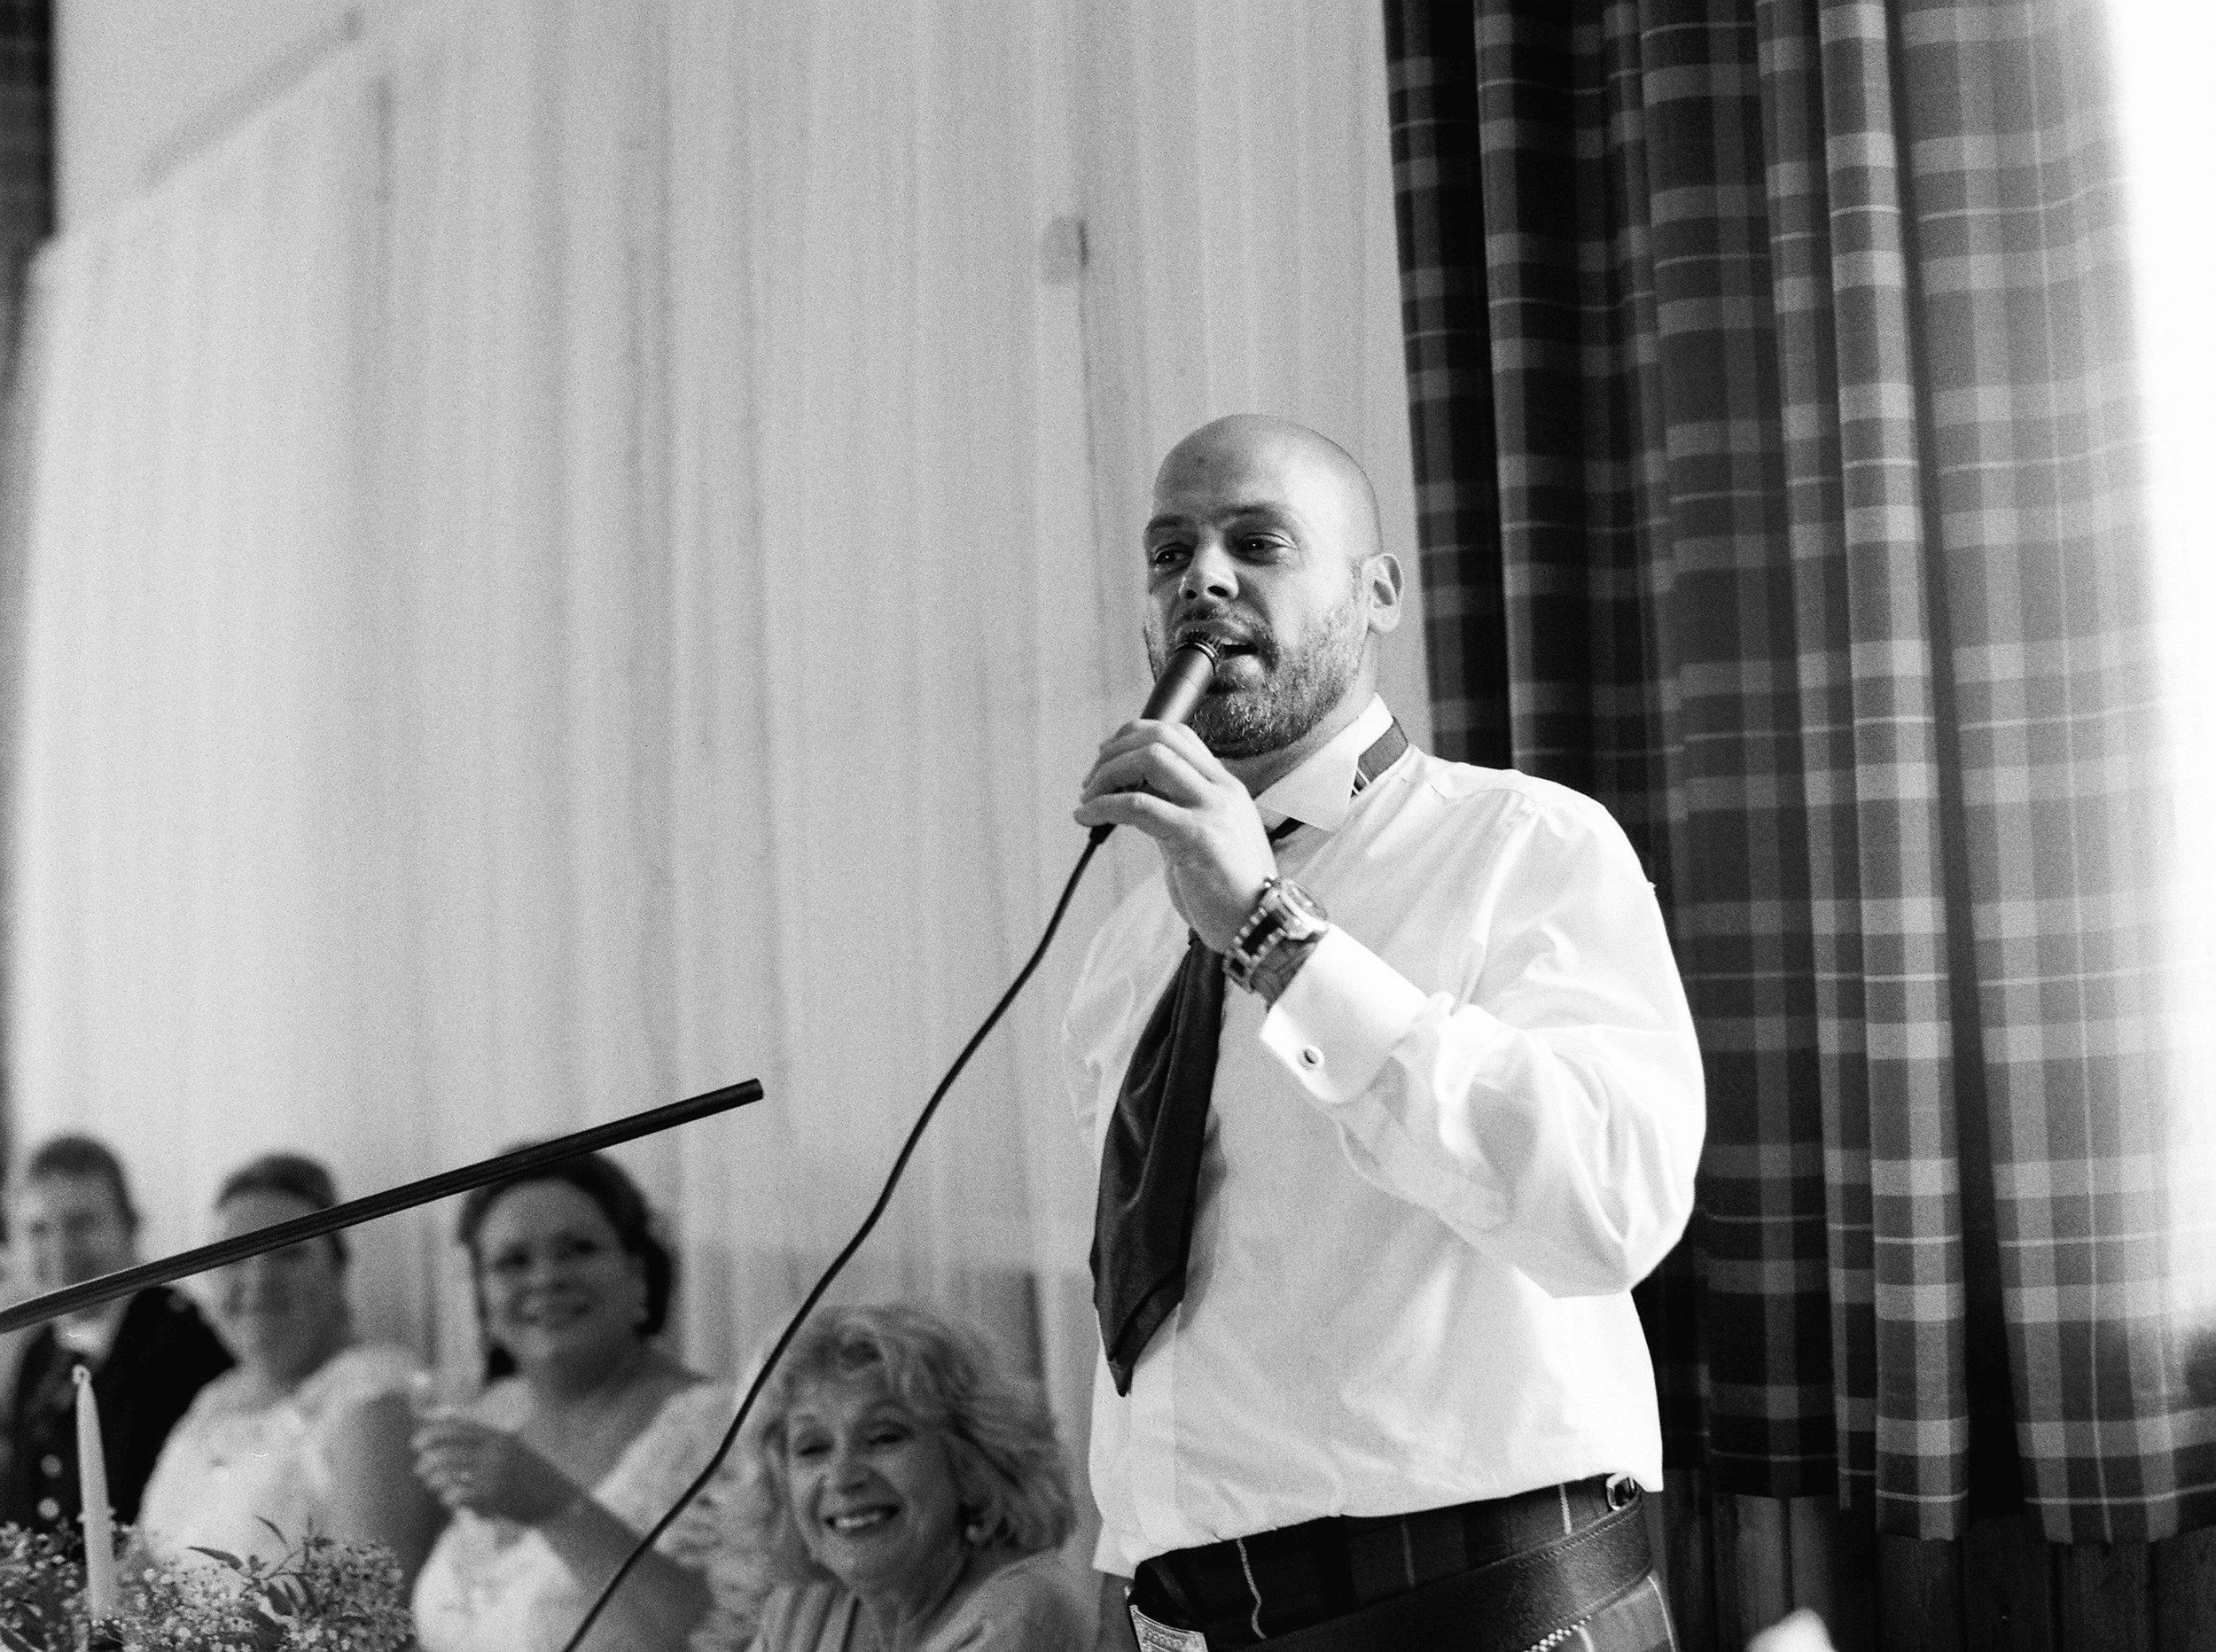 wedding-photography-scotland207.jpg